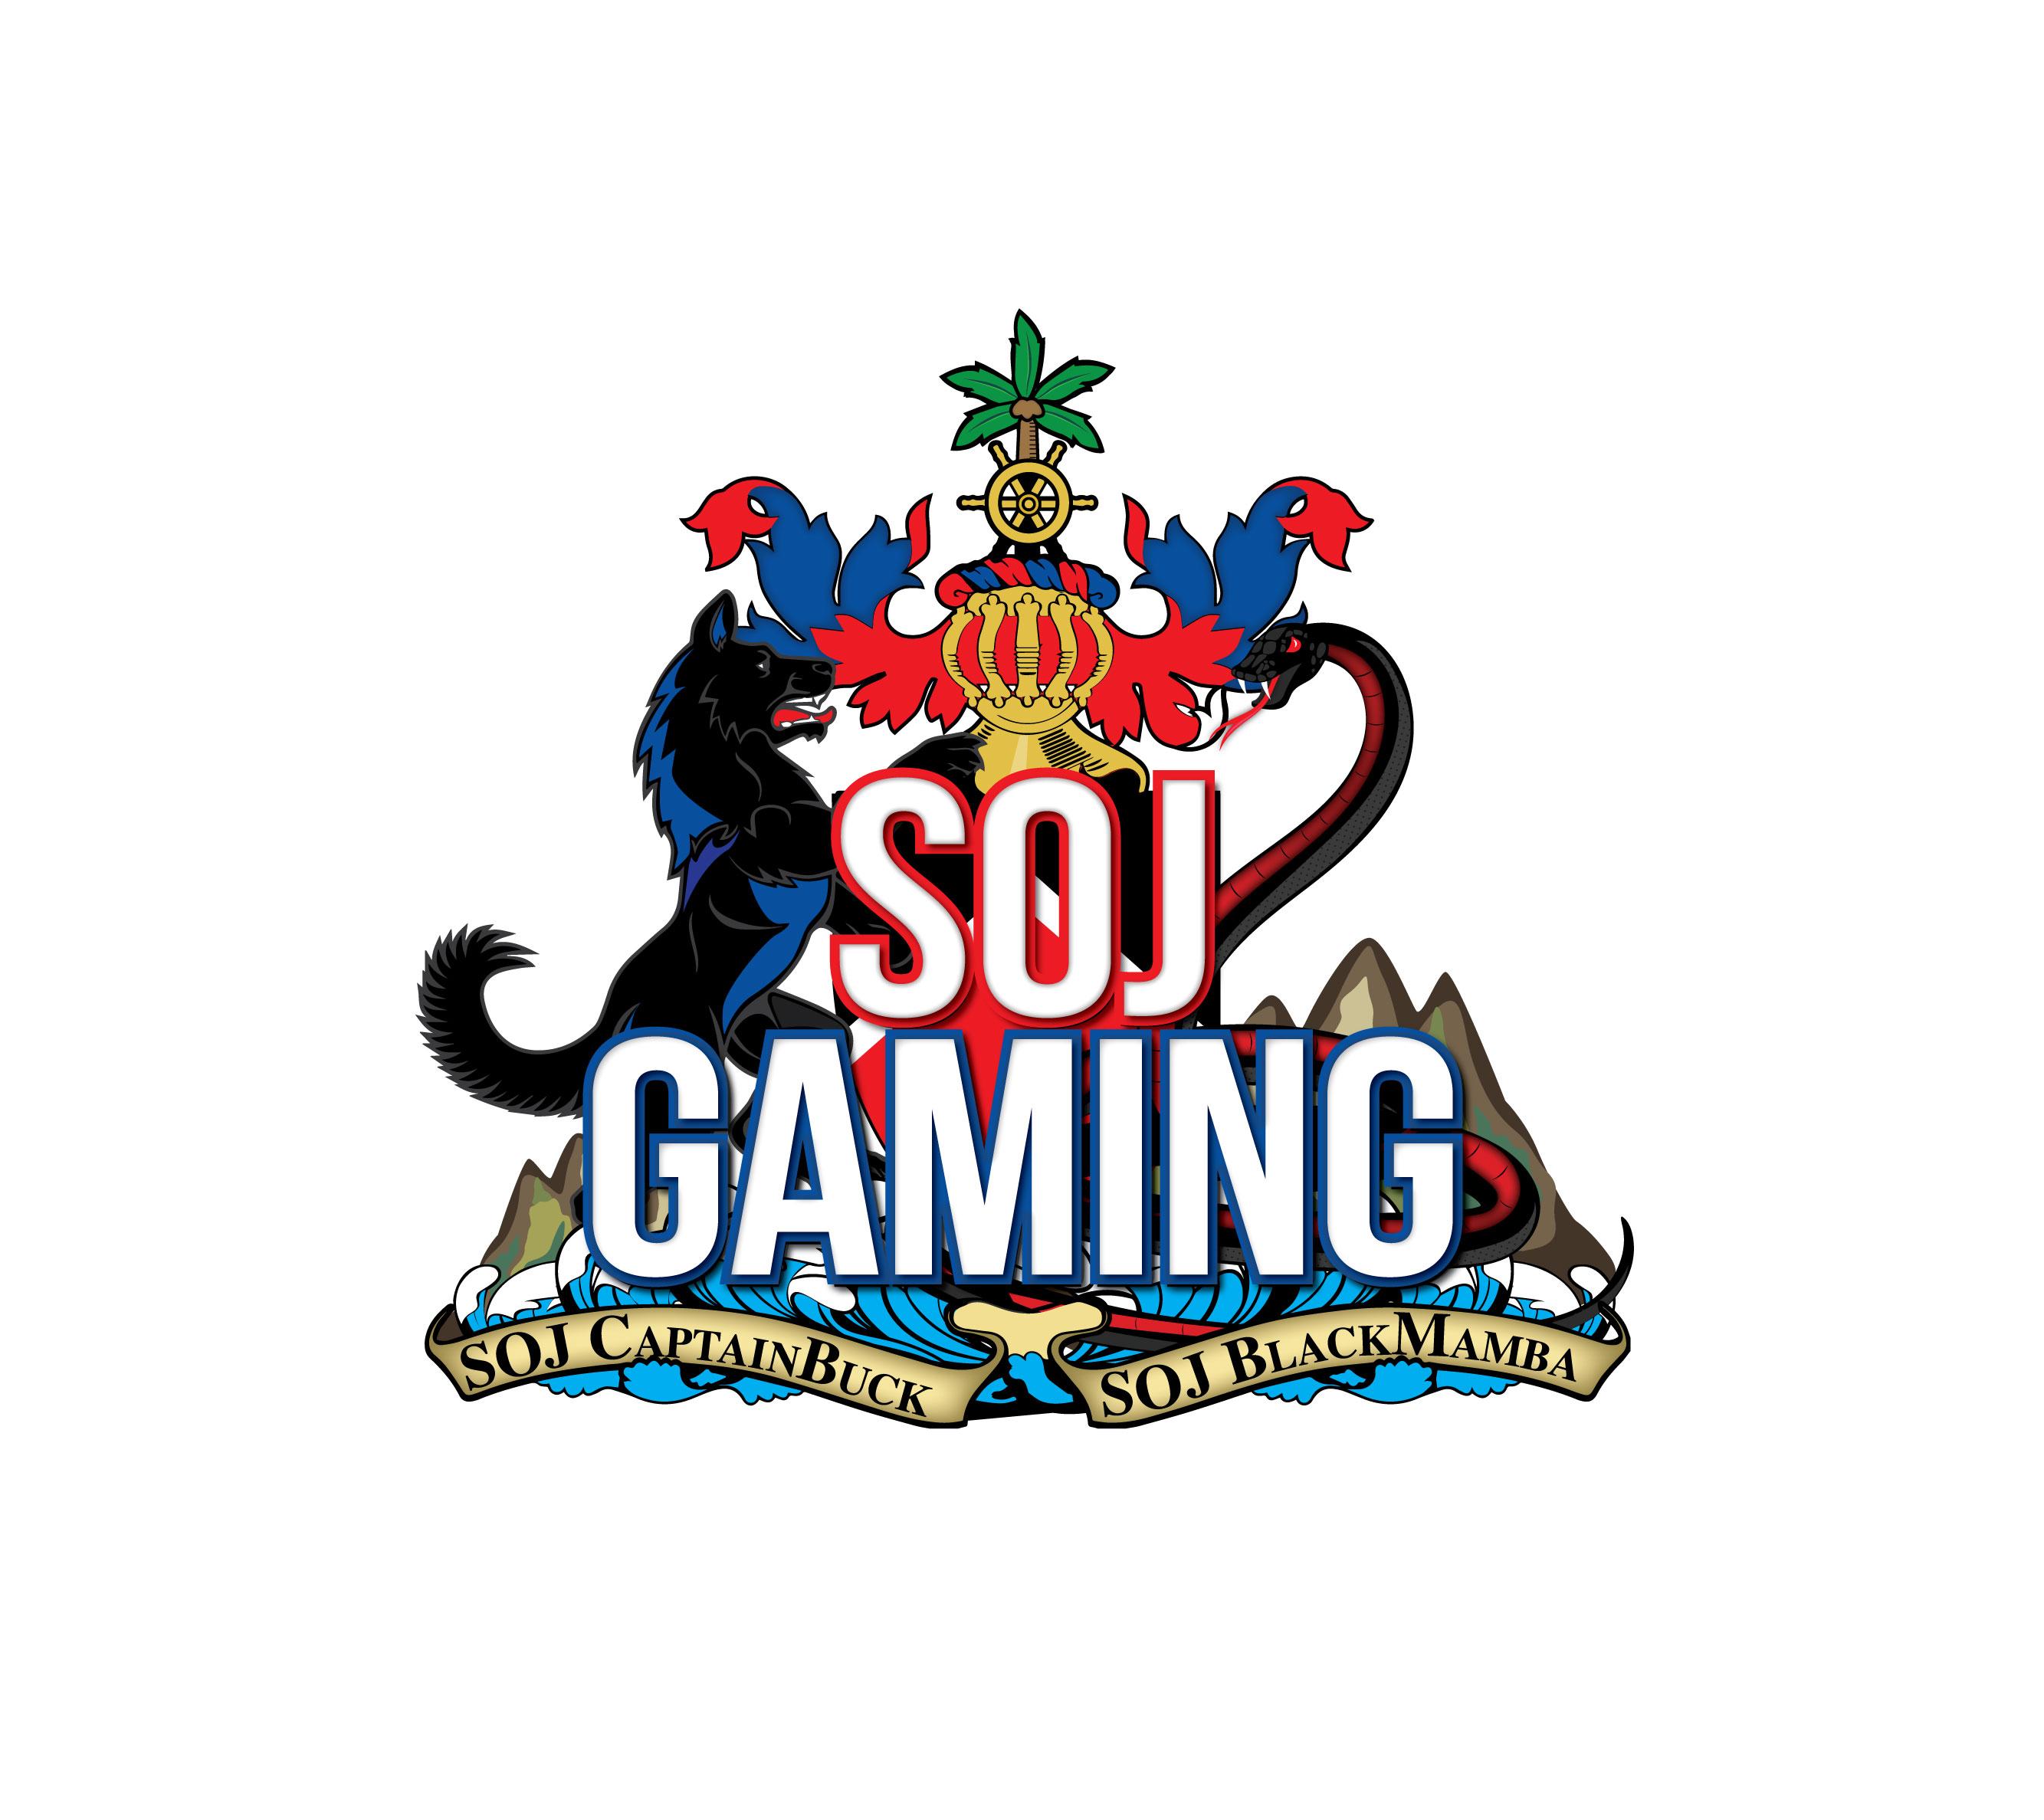 SOJ-Gaming-thumbnail